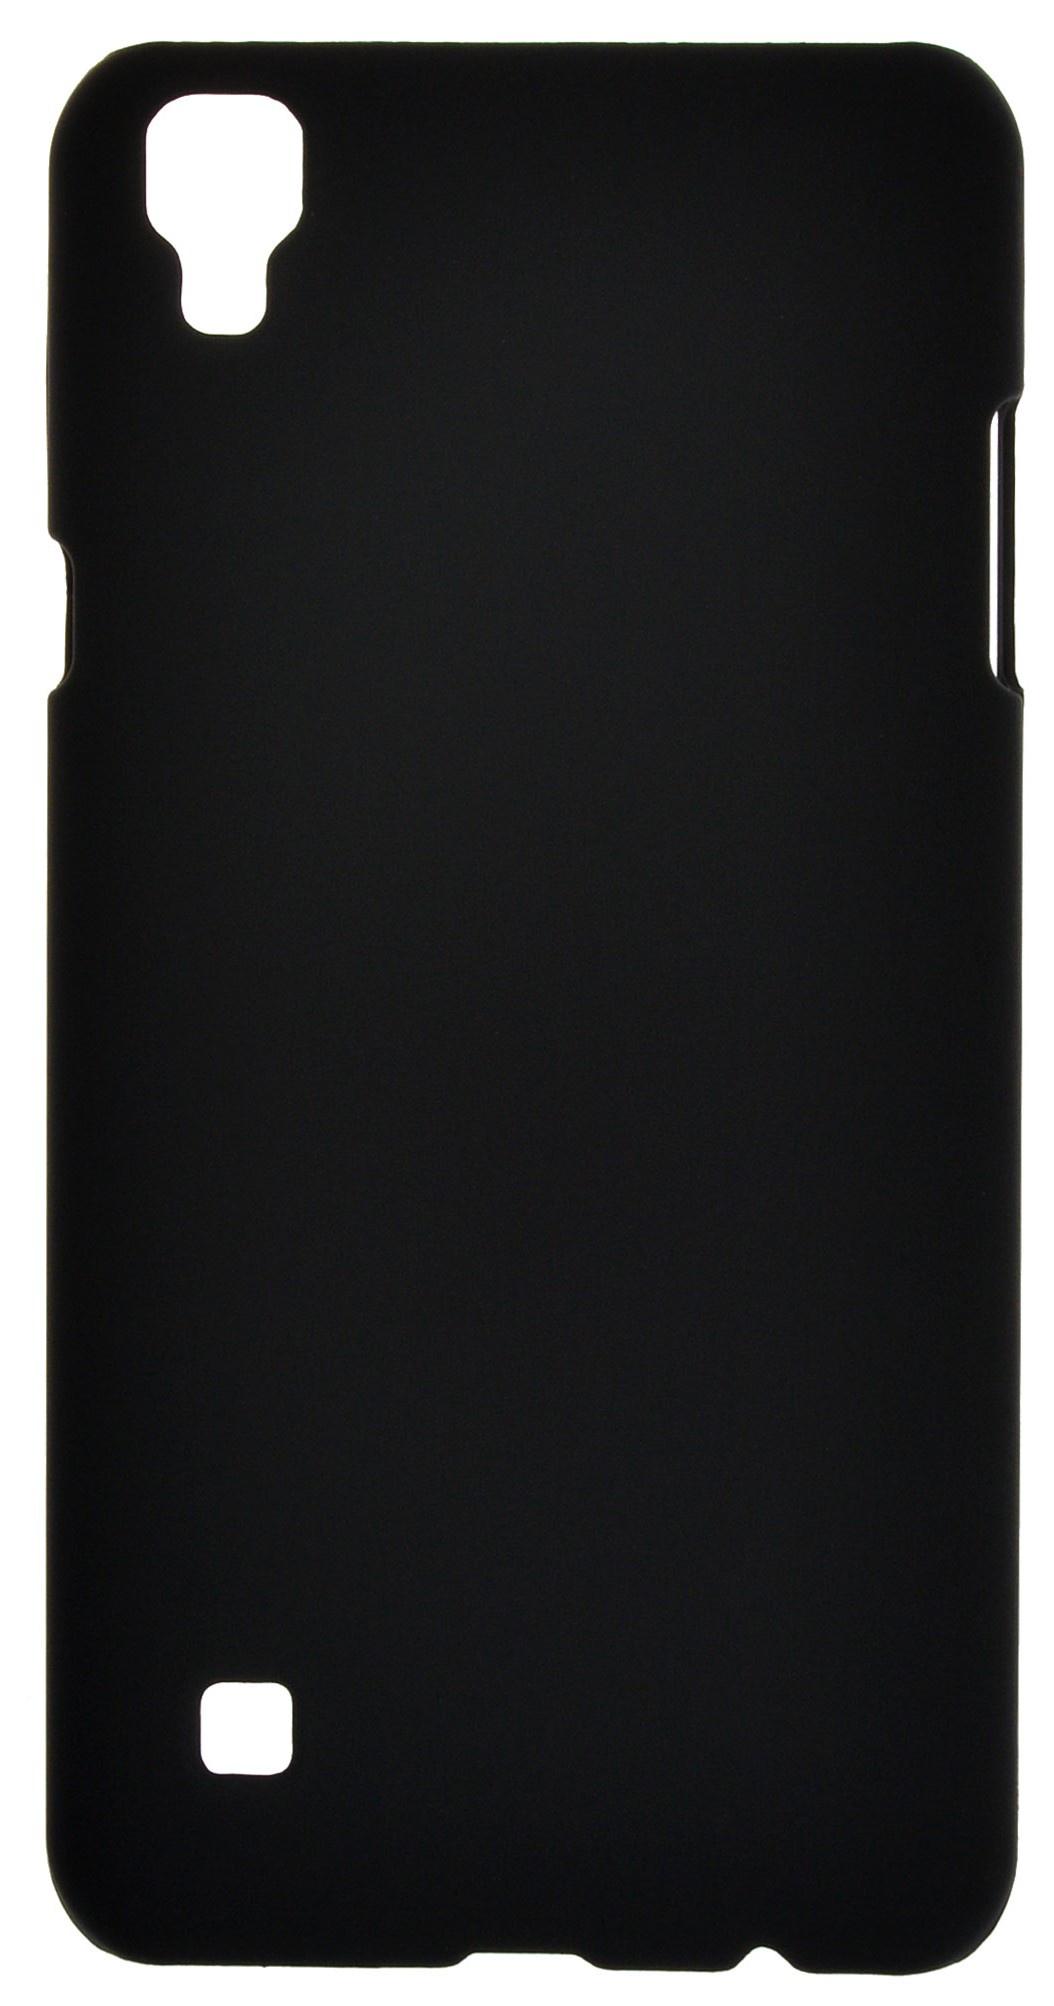 Накладка Skinbox для LG X Style, 2000000097398, черный